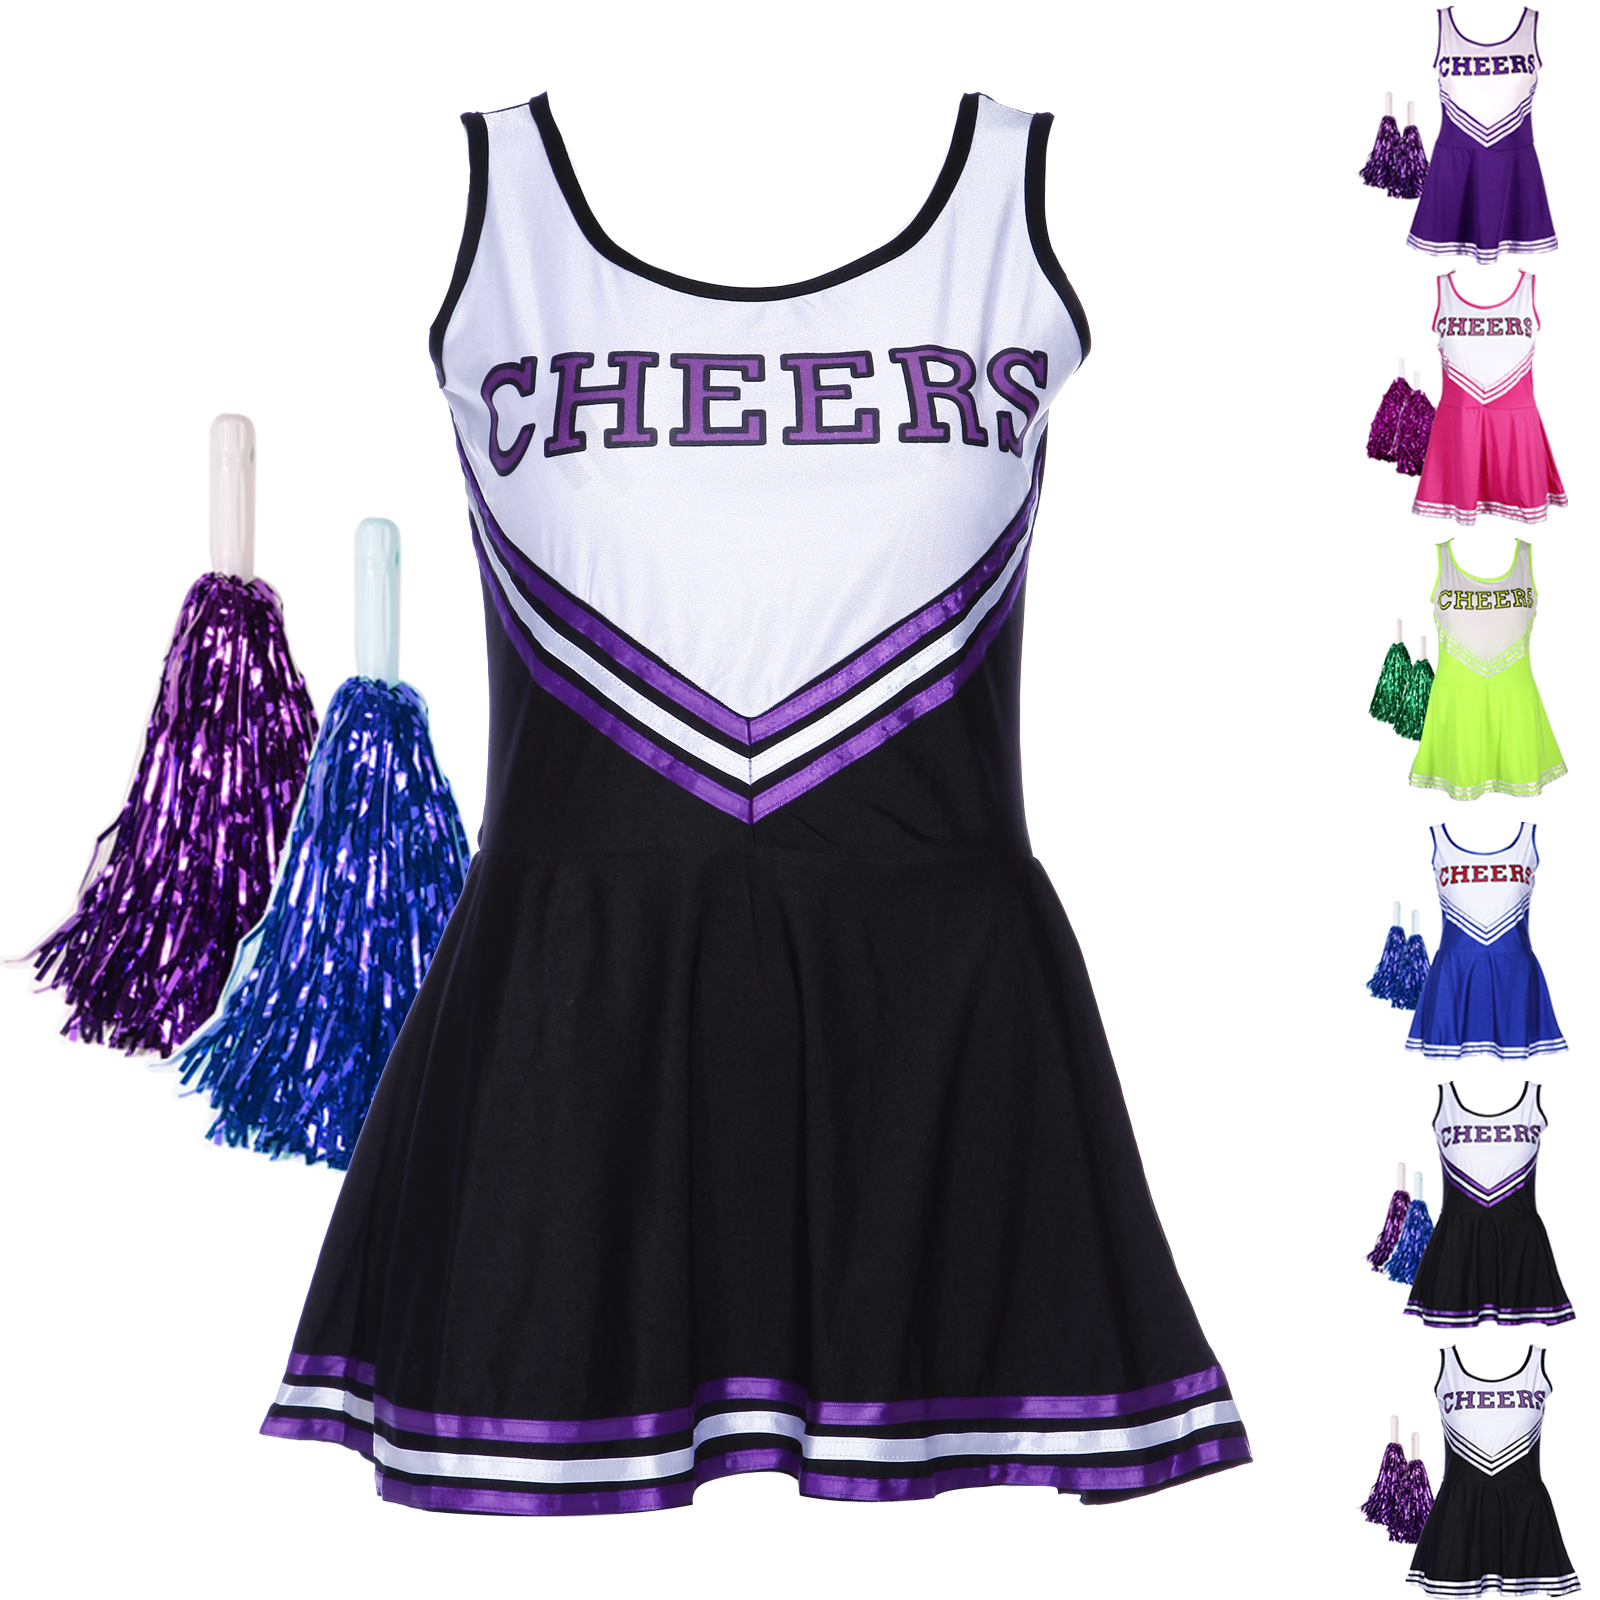 Cheerleader Fancy Dress Outfit Uniforme High School Musical Costume avec pompons